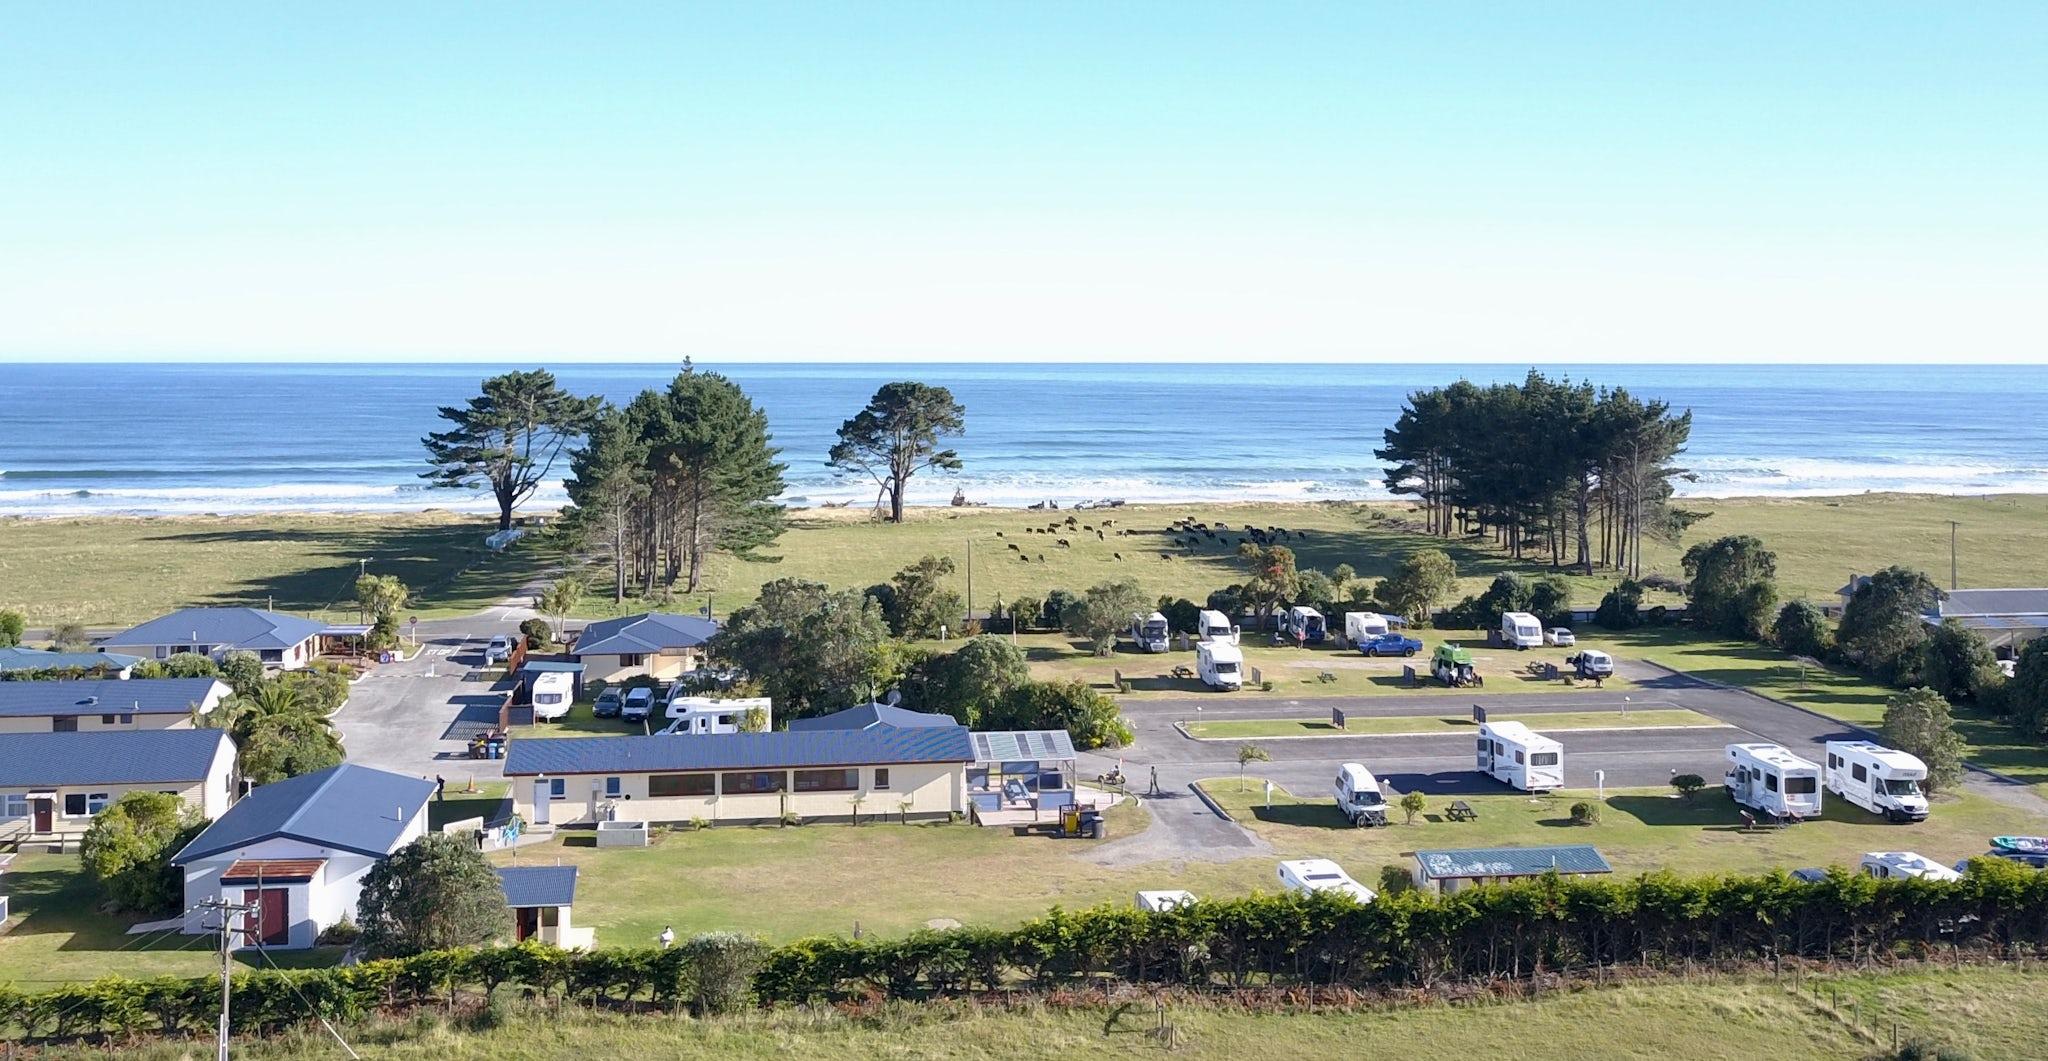 Carters Beach Top 10 Holiday Park Westport Top 10